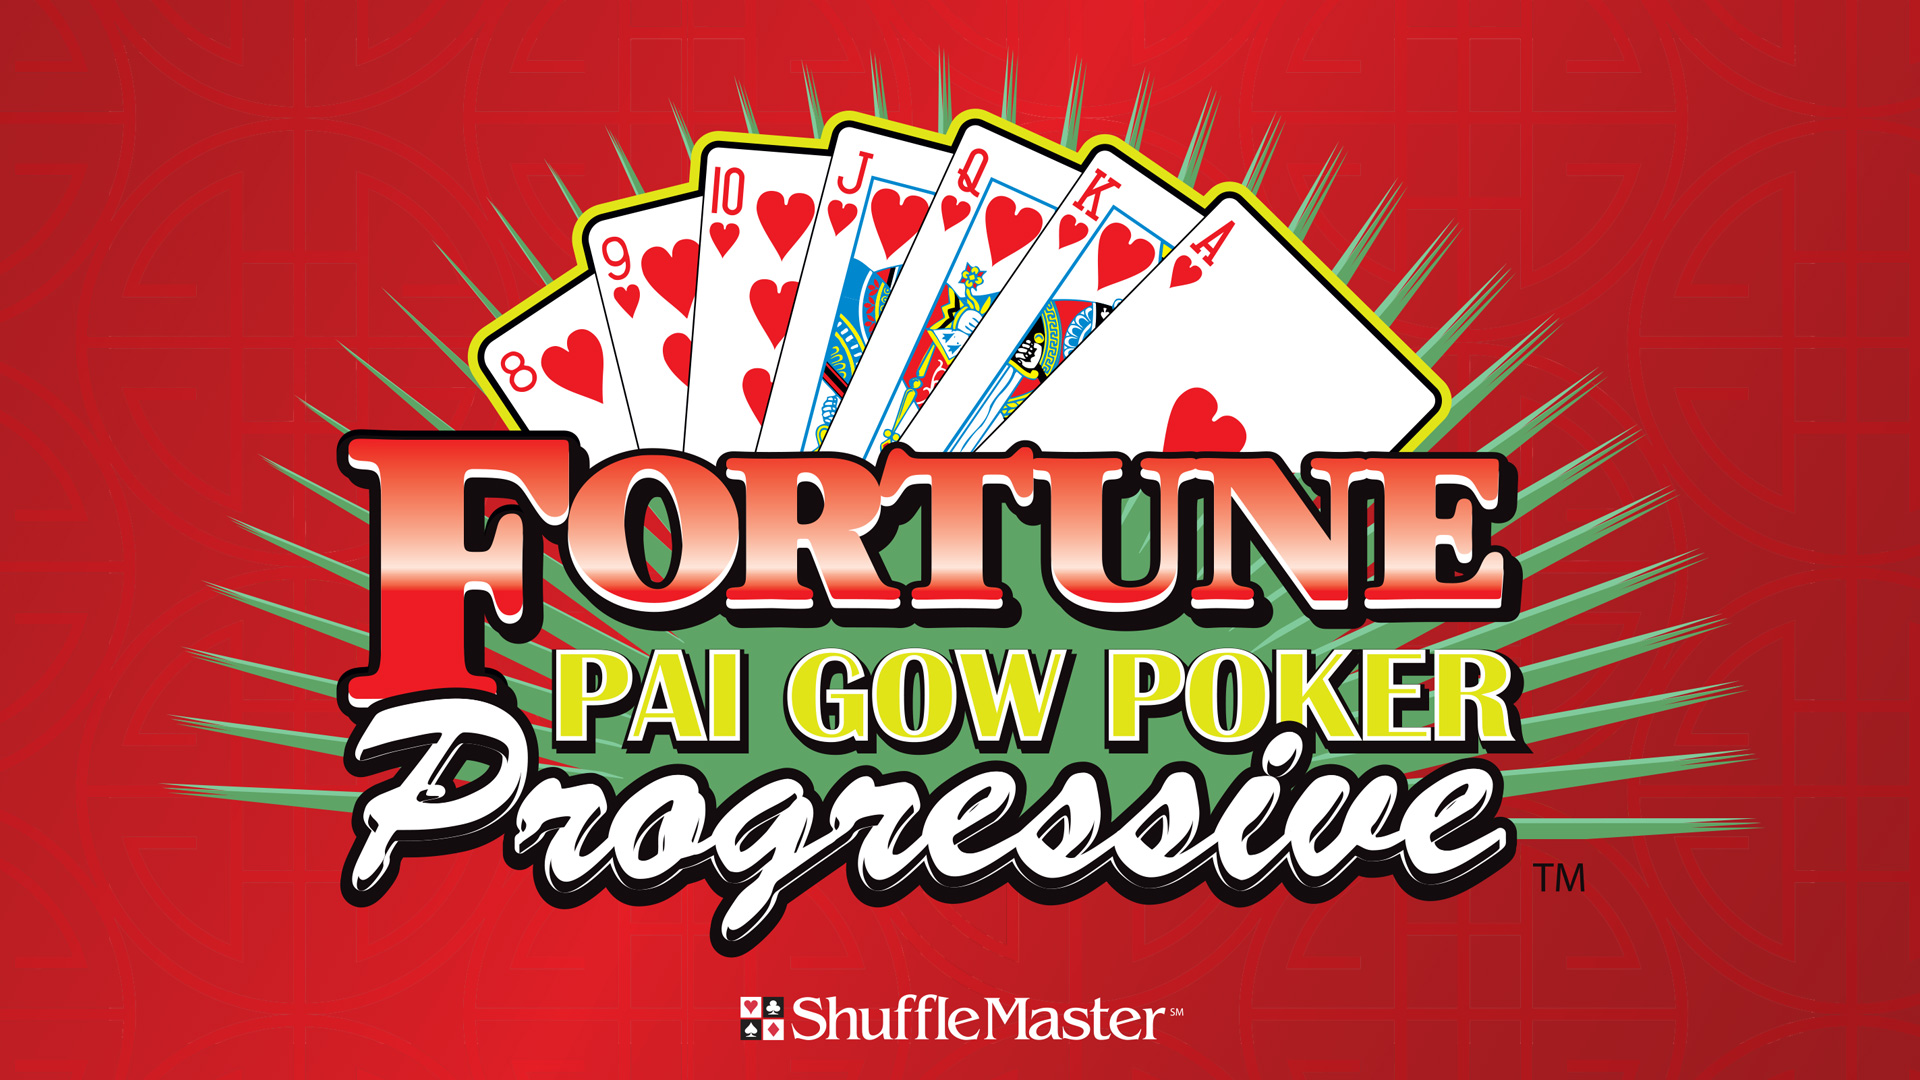 Fortune Pai Gow Poker Progressive logo